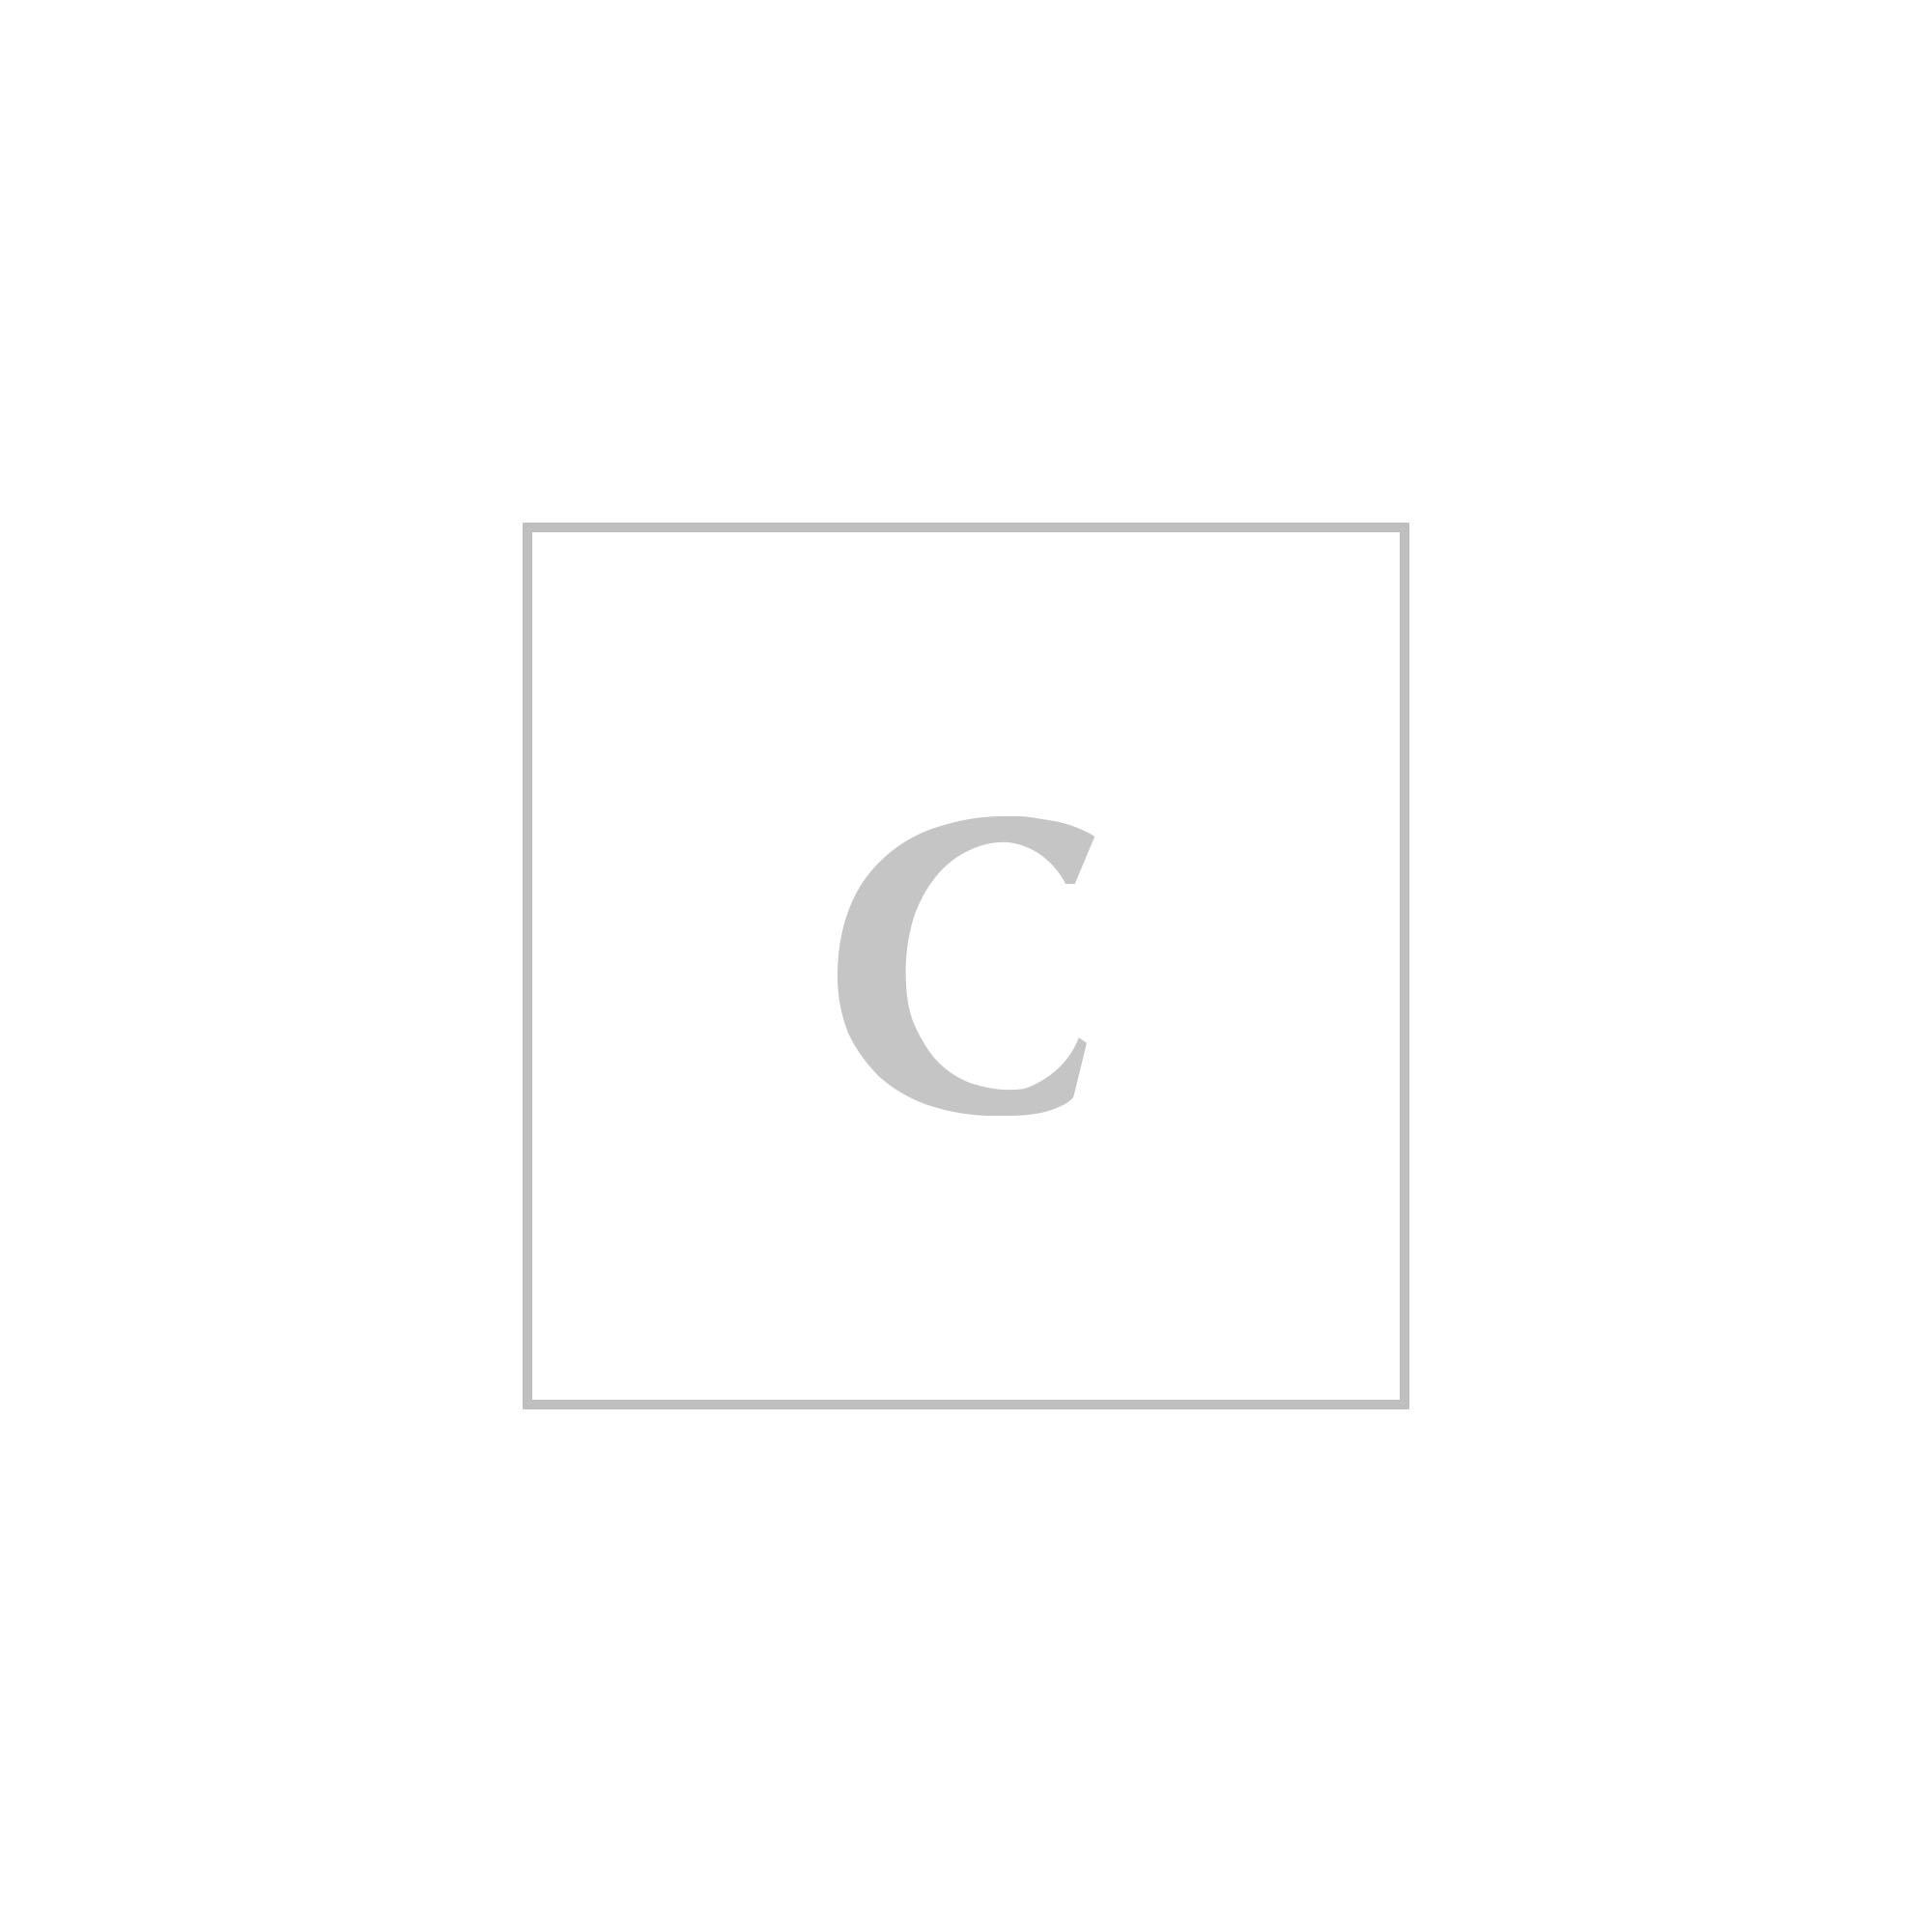 Christian Dior tricolor cannage lady dior bag